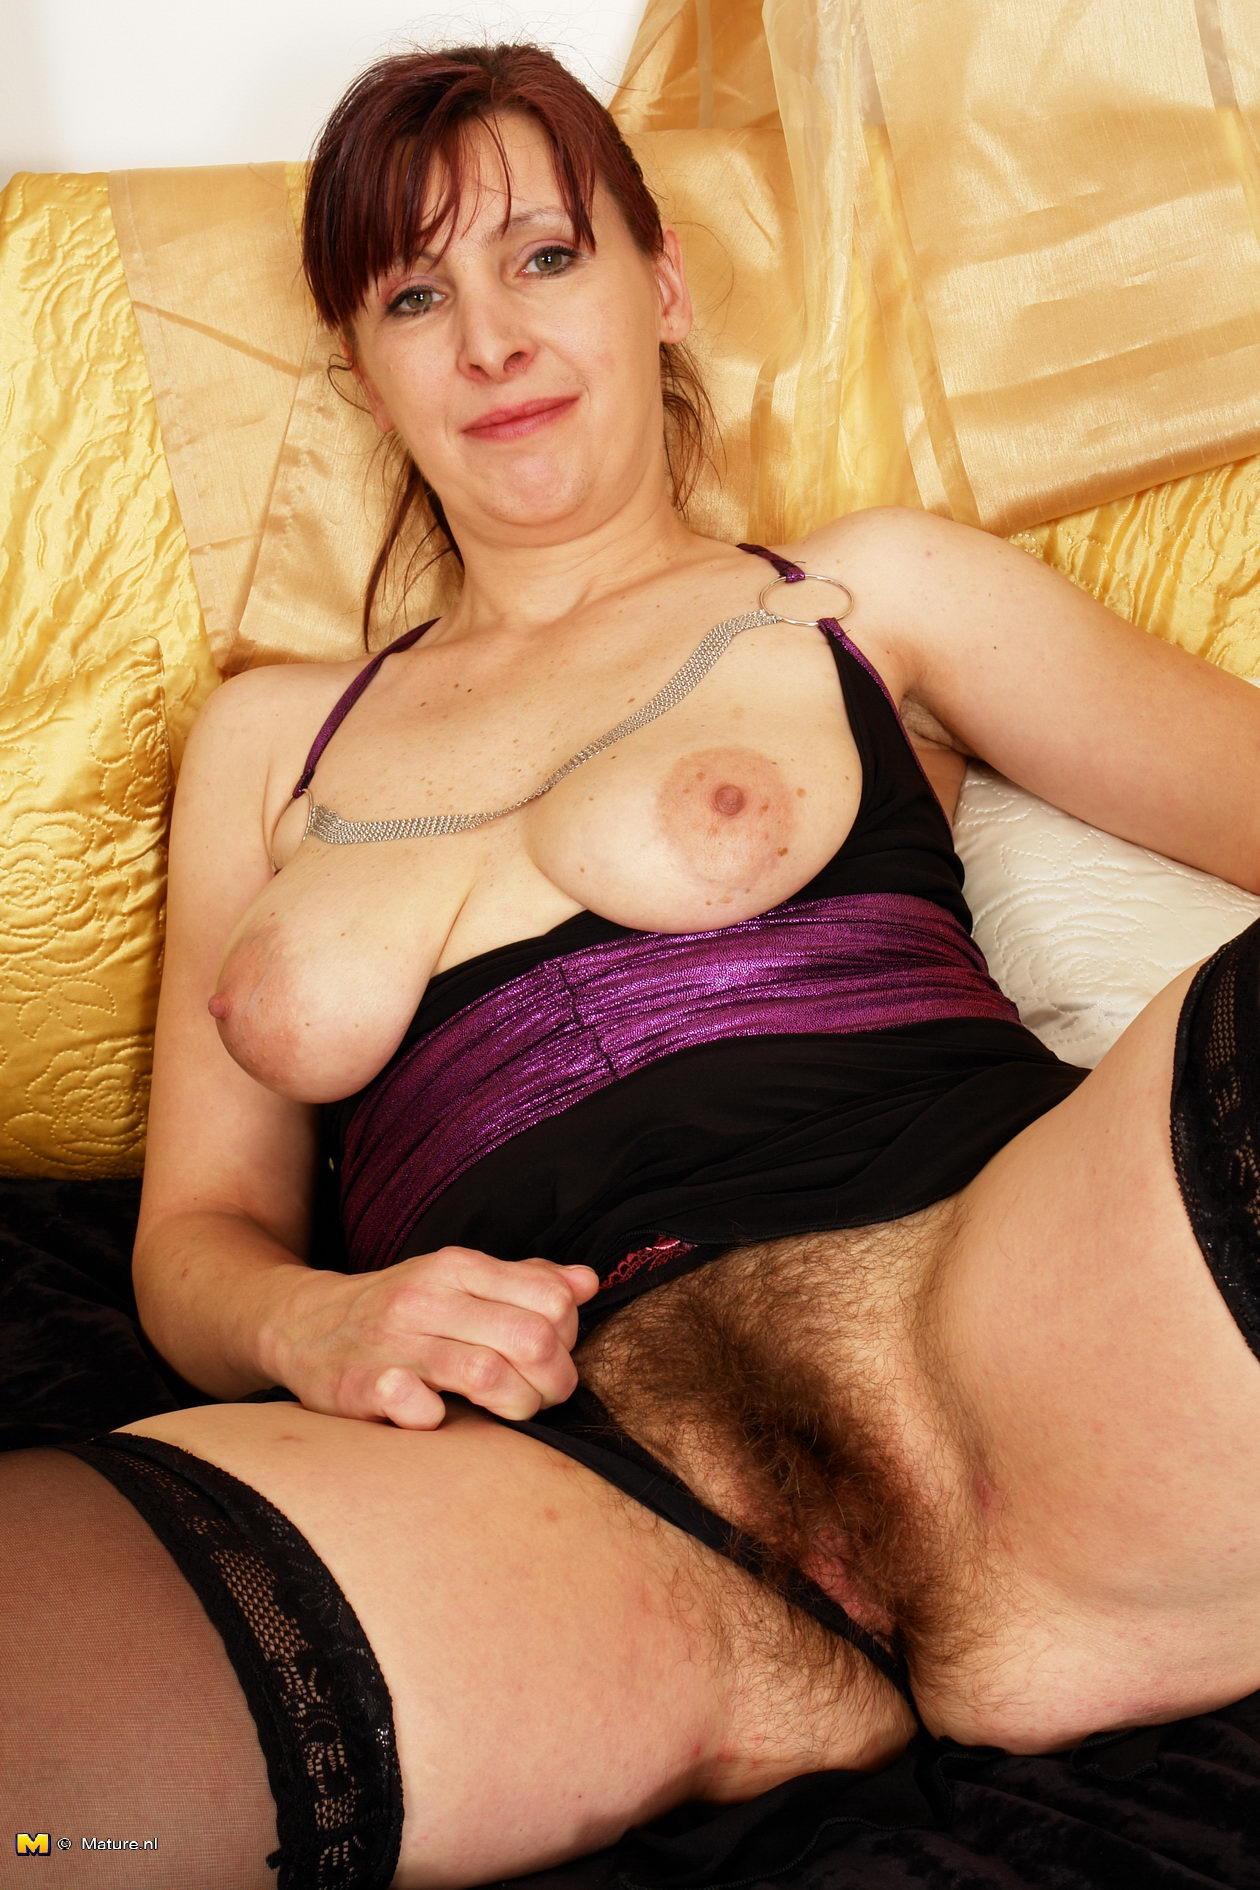 Photo womansex gallery sex scene